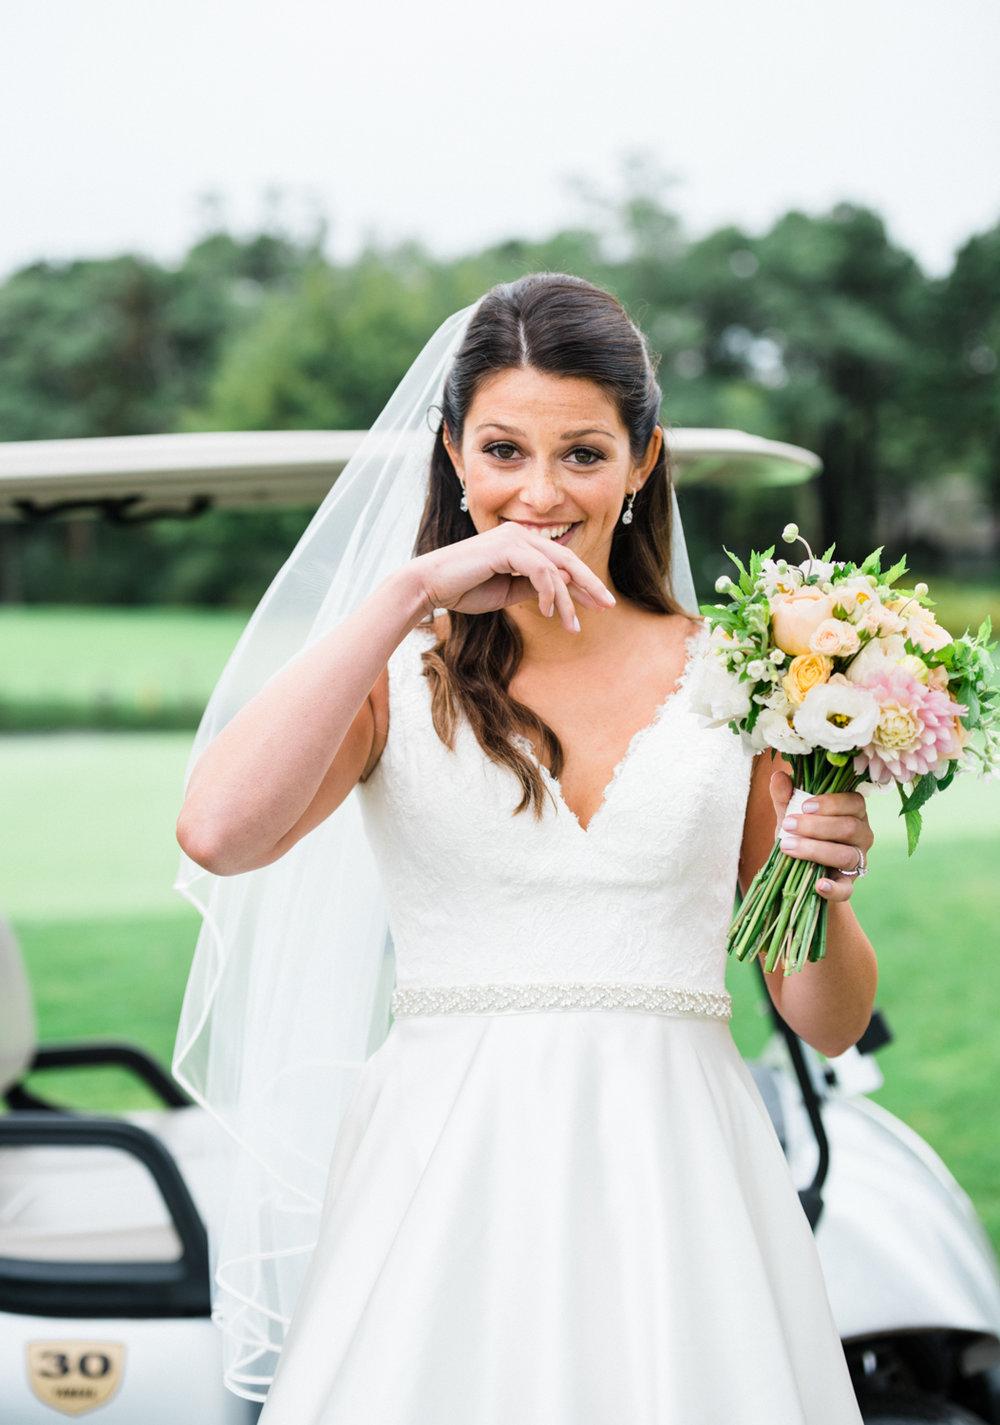 maureen_evan_wedding_marthas_vineyard-8502_first_look_farm_neck.jpg